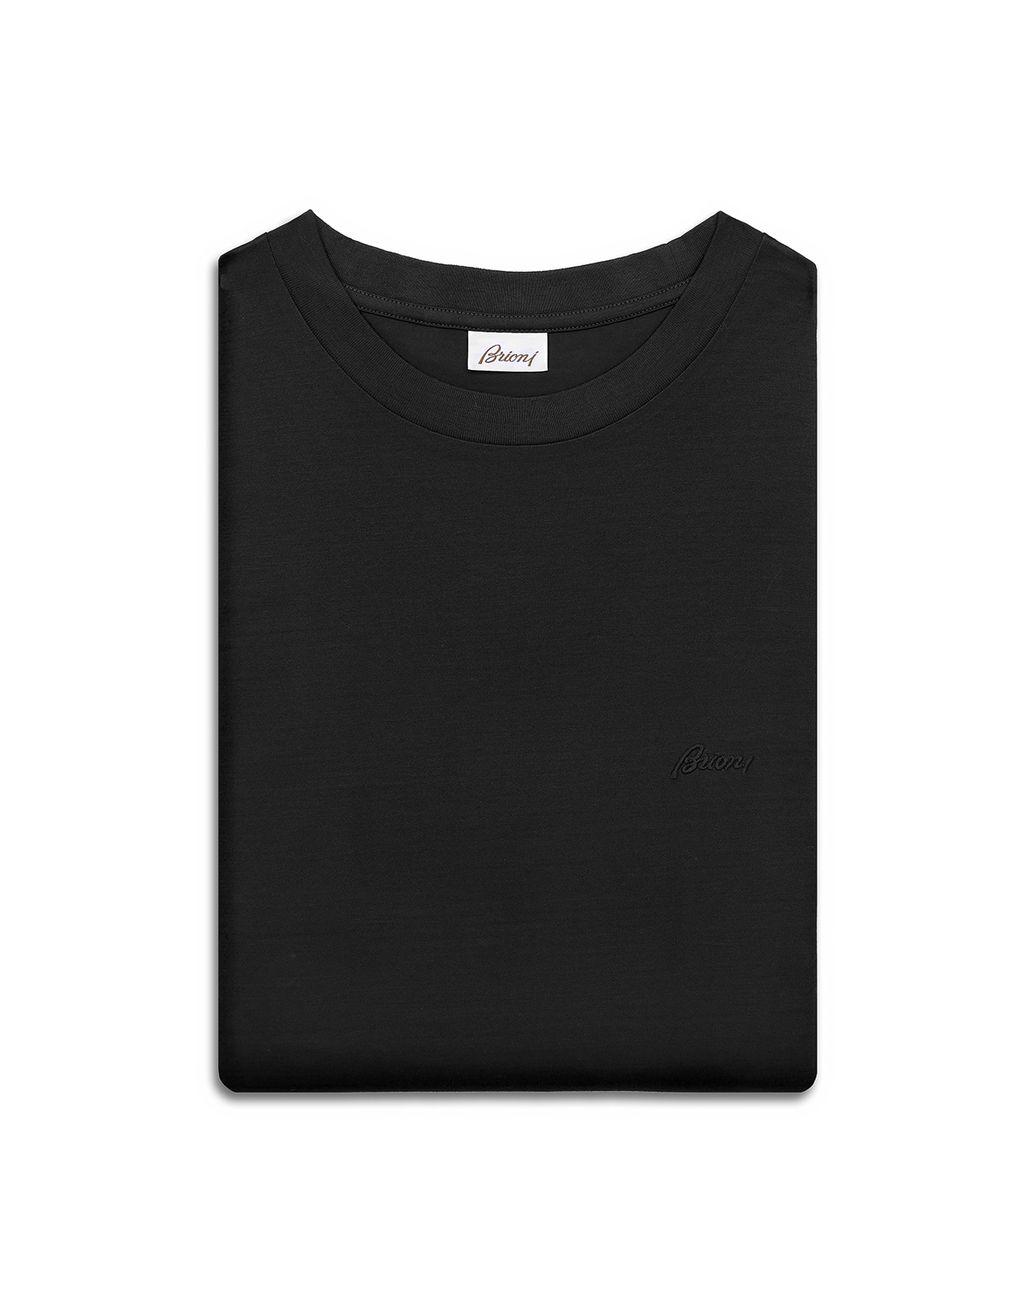 BRIONI Black Logoed T-Shirt T-shirts & polos Homme e